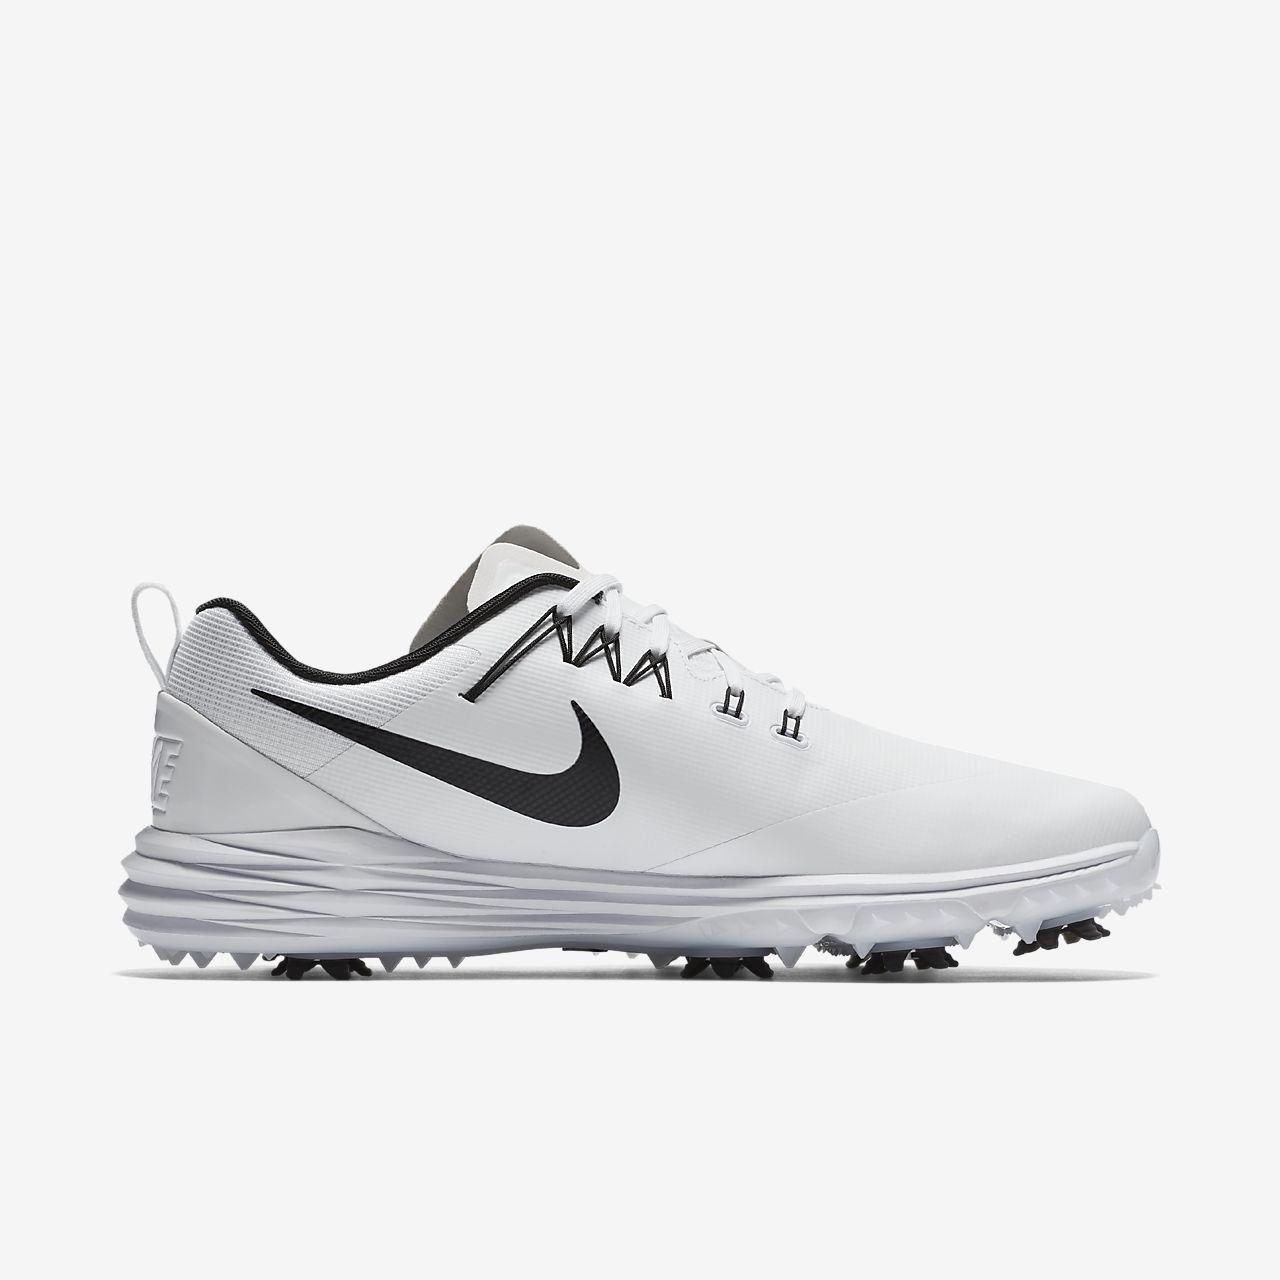 ... Nike Lunar Command 2 (Wide) Men's Golf Shoe